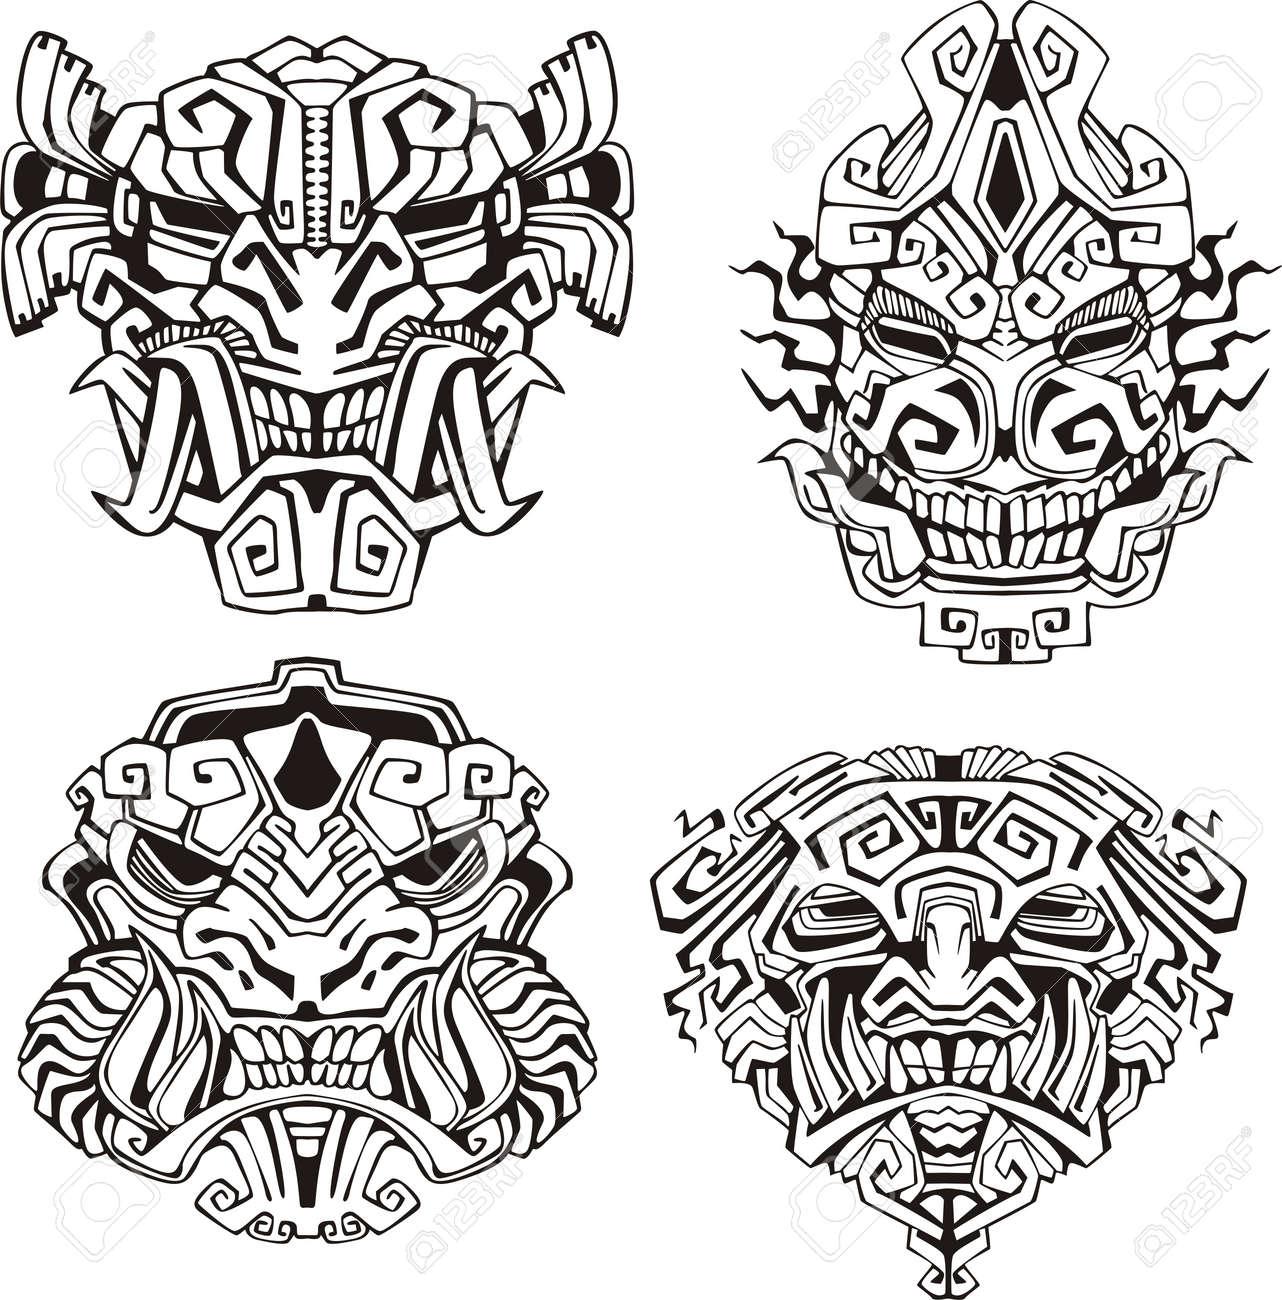 Aztec monster totem masks. Set of black and white vector illustrations. Stock Vector - 16729495